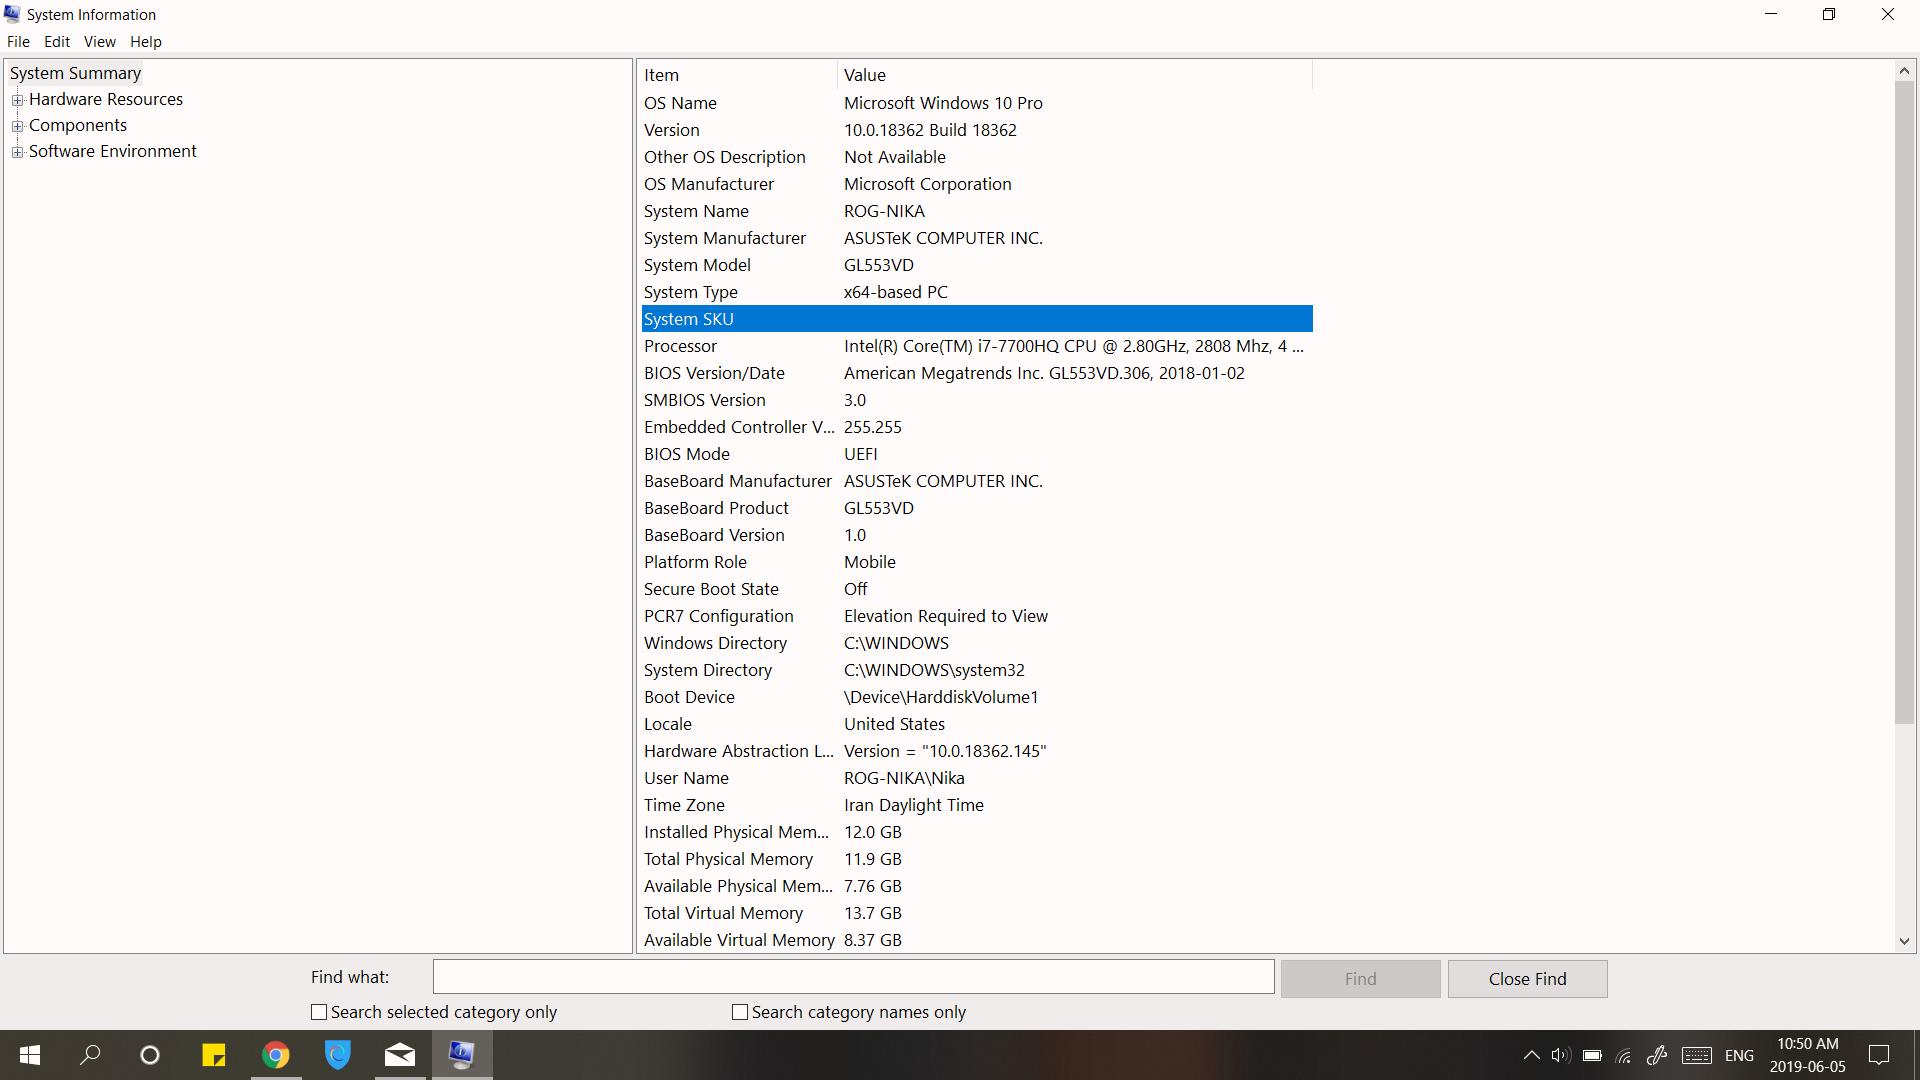 0x000007b error HEEEELP! - Microsoft Community